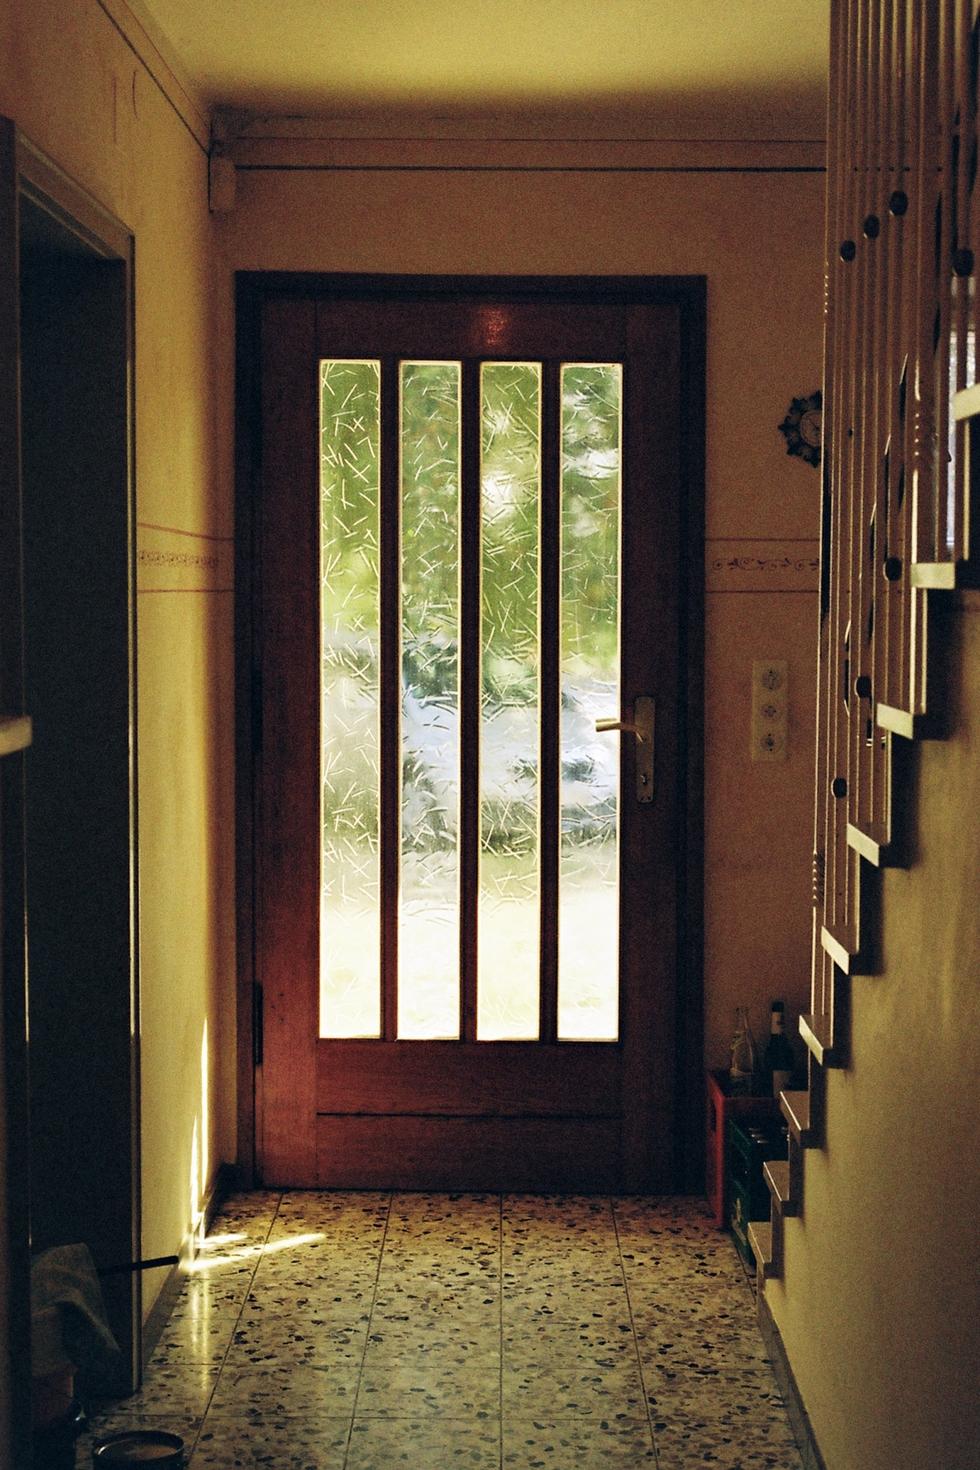 frontdoor with glass yellow light